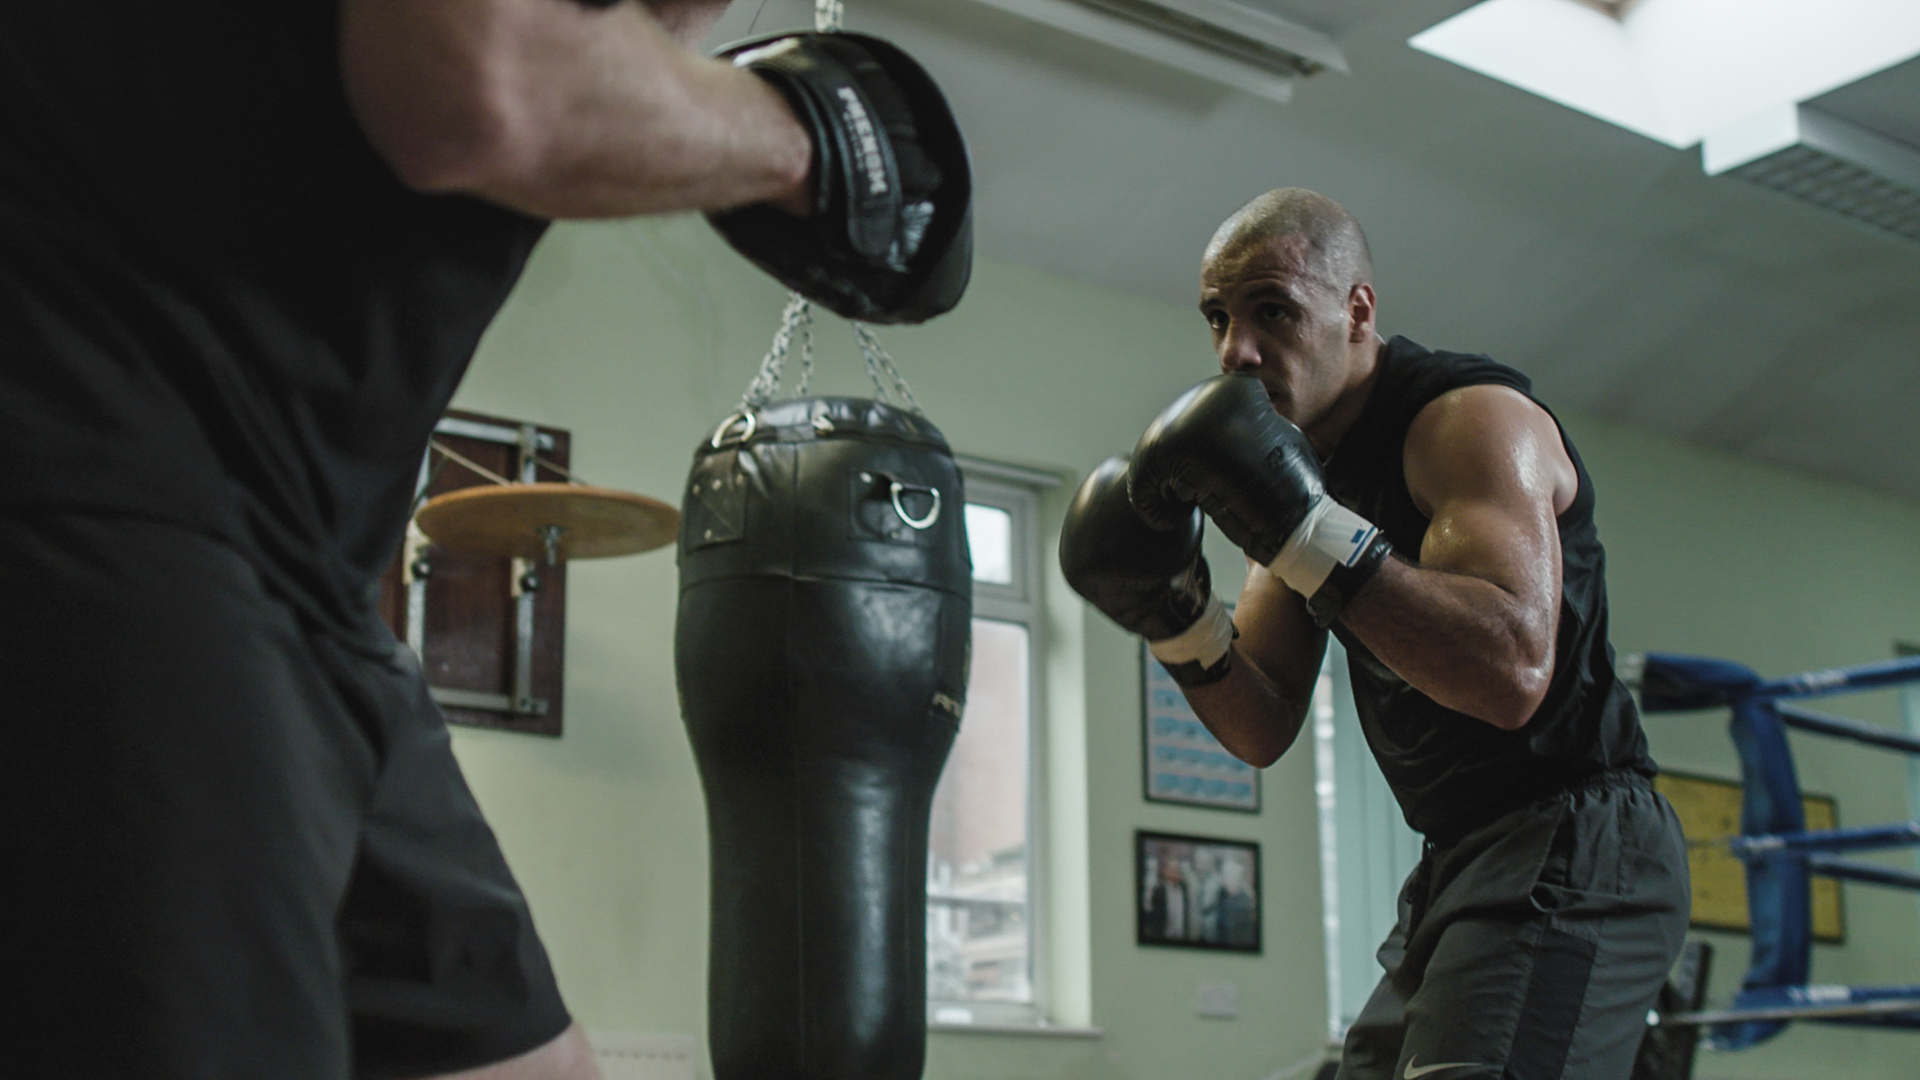 Kal Yafai - Punching Bag and Gloves